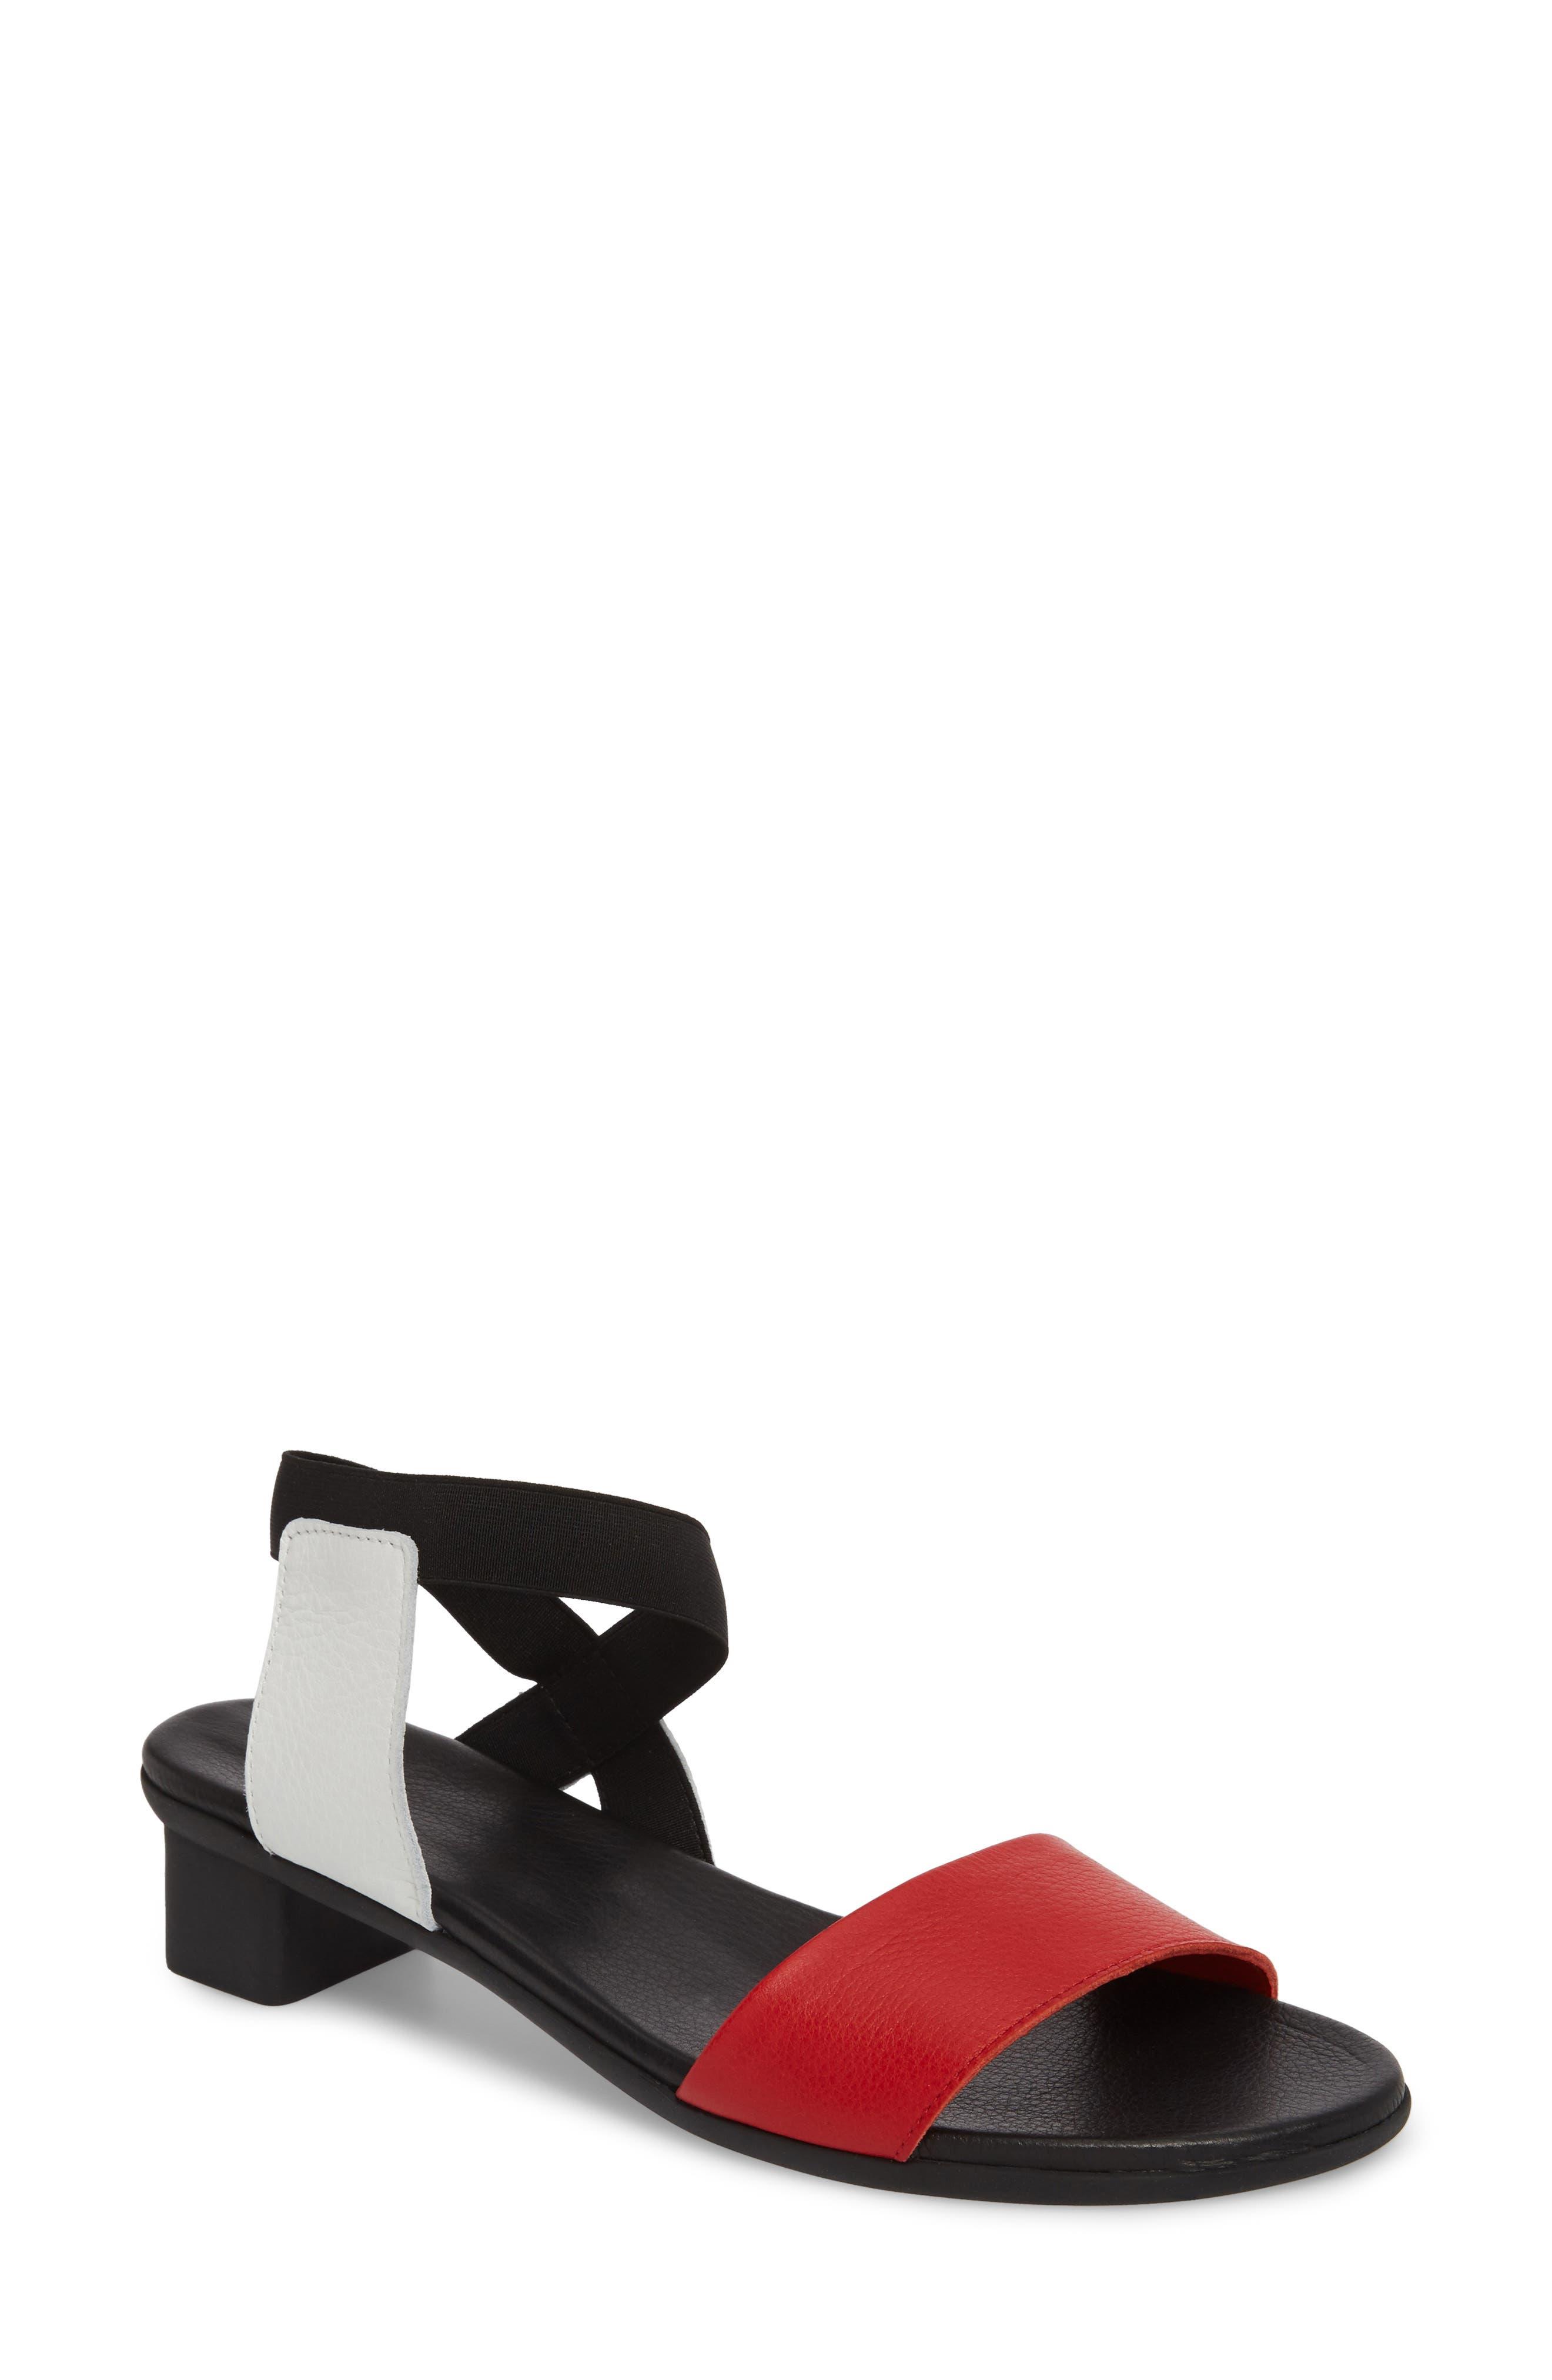 Main Image - Arche Obiaze Sandal (Women)